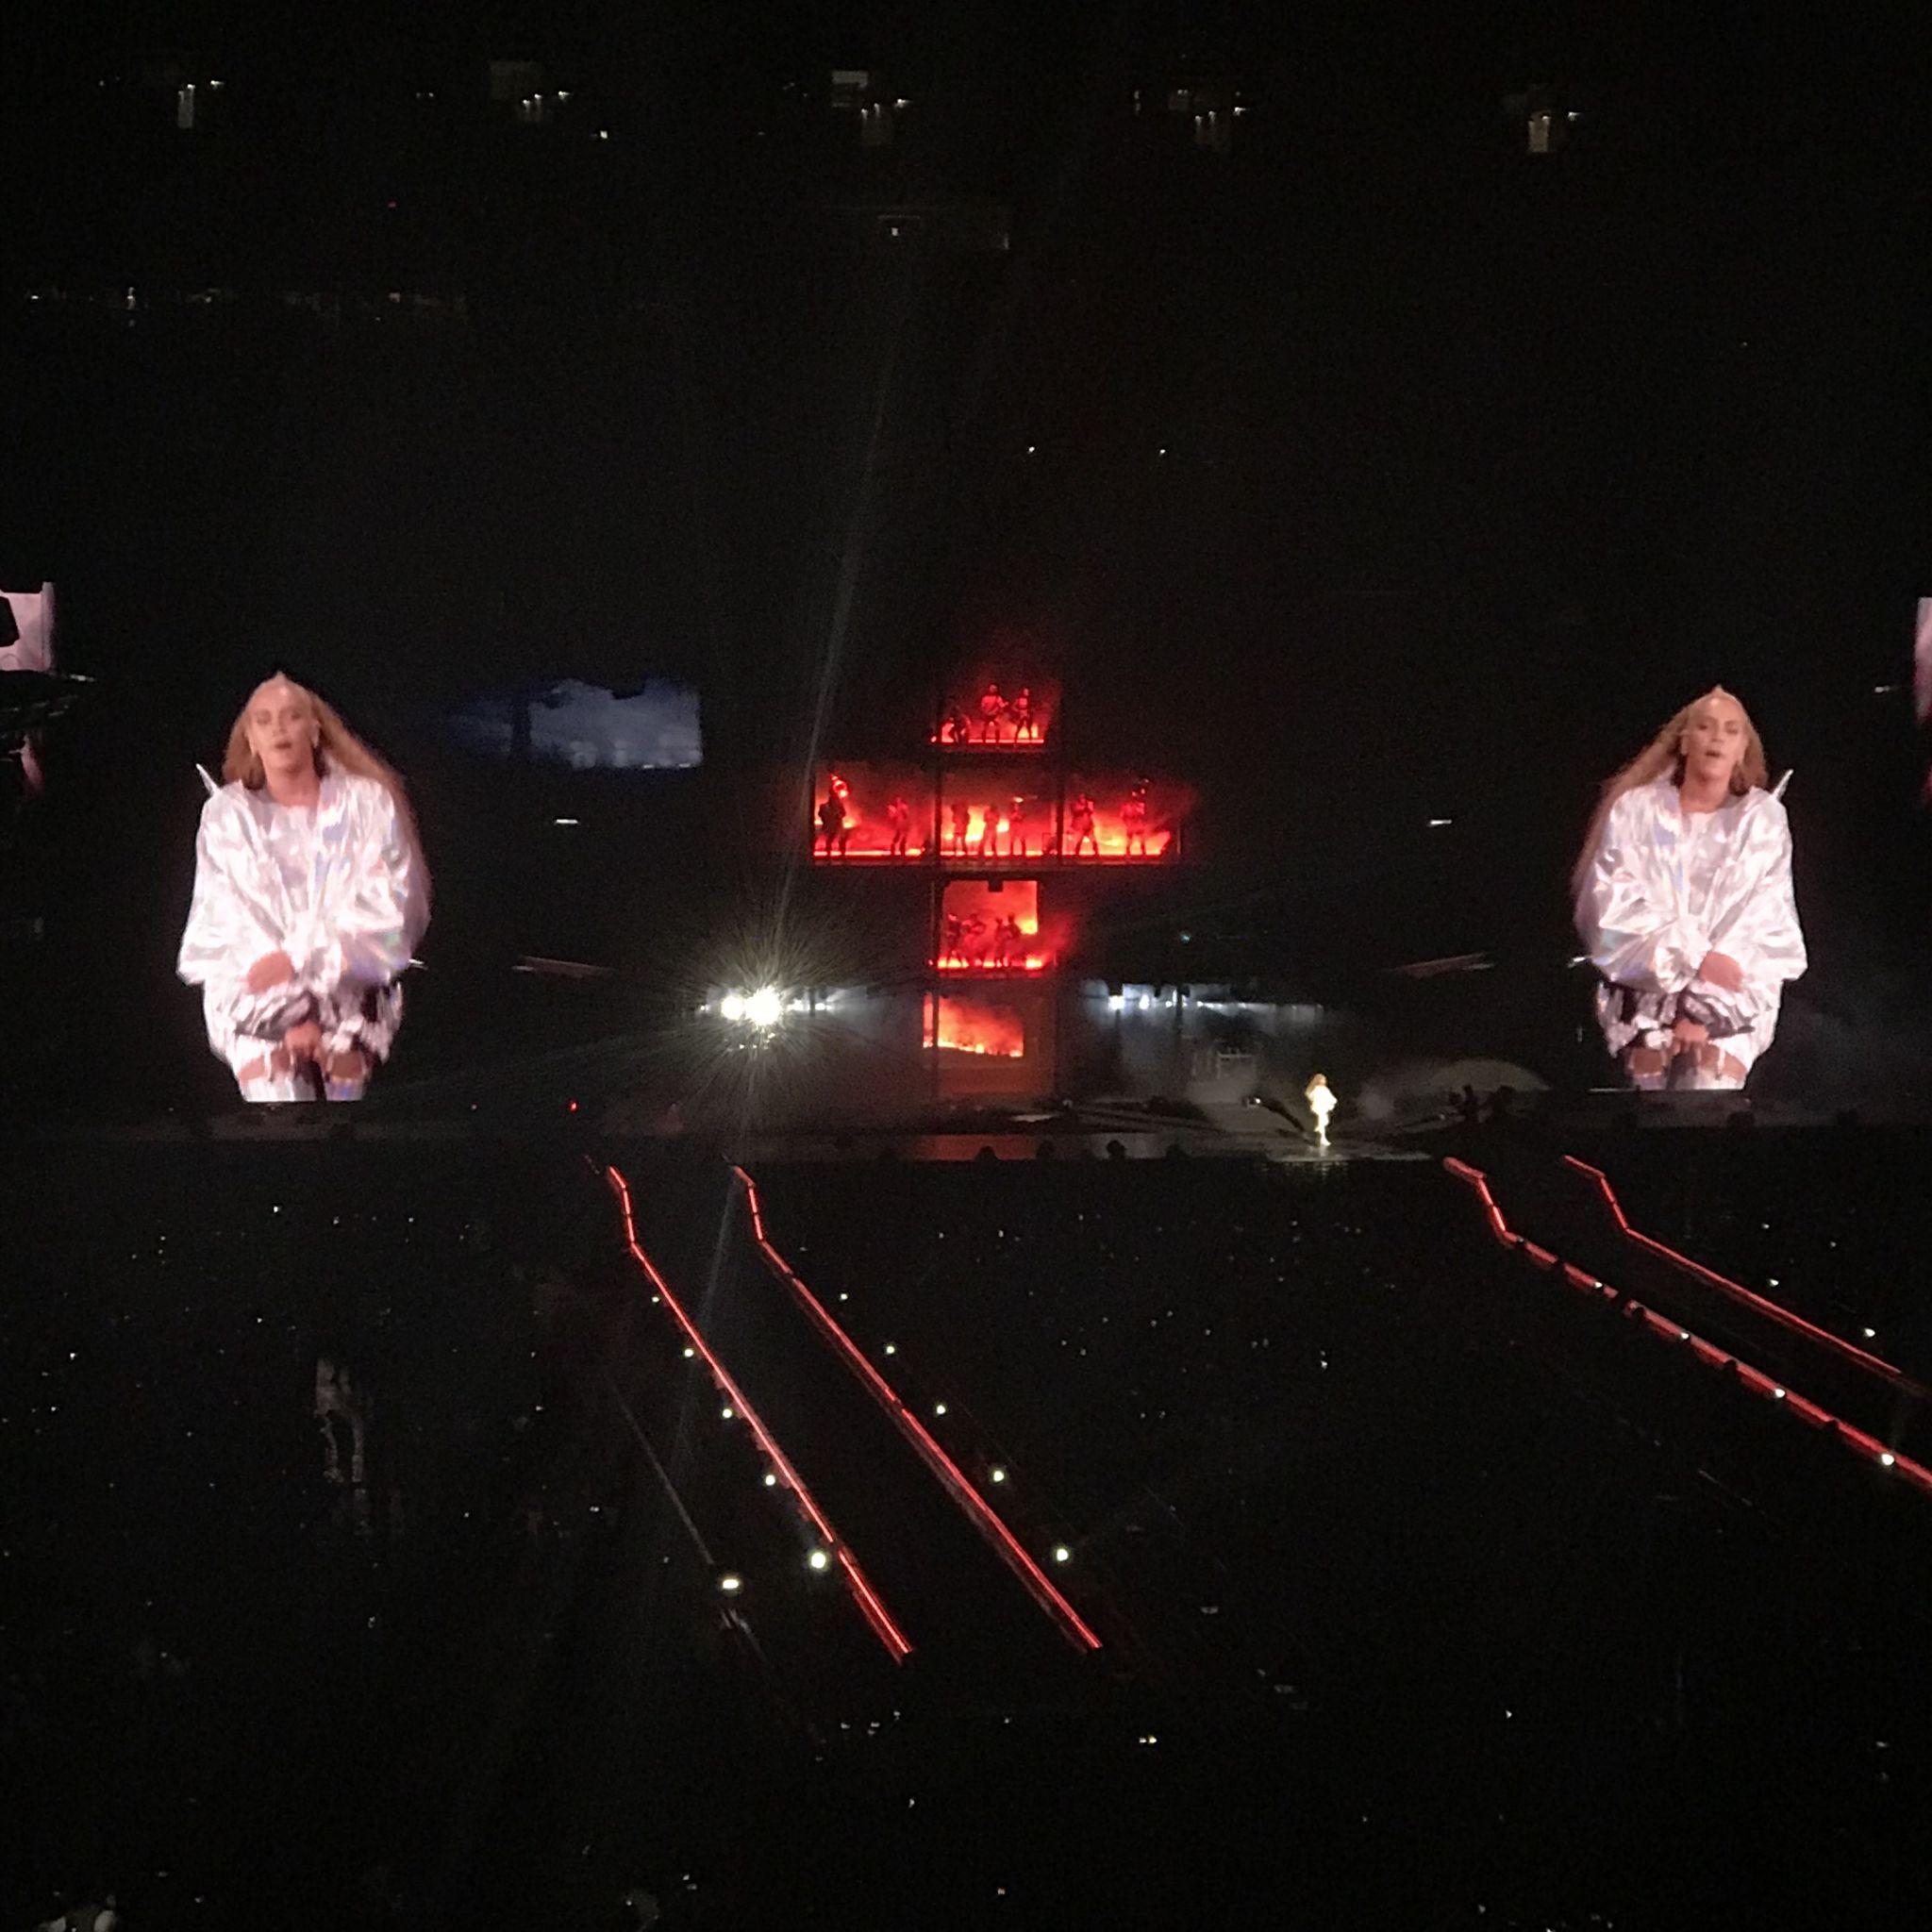 Beyoncé JayZ